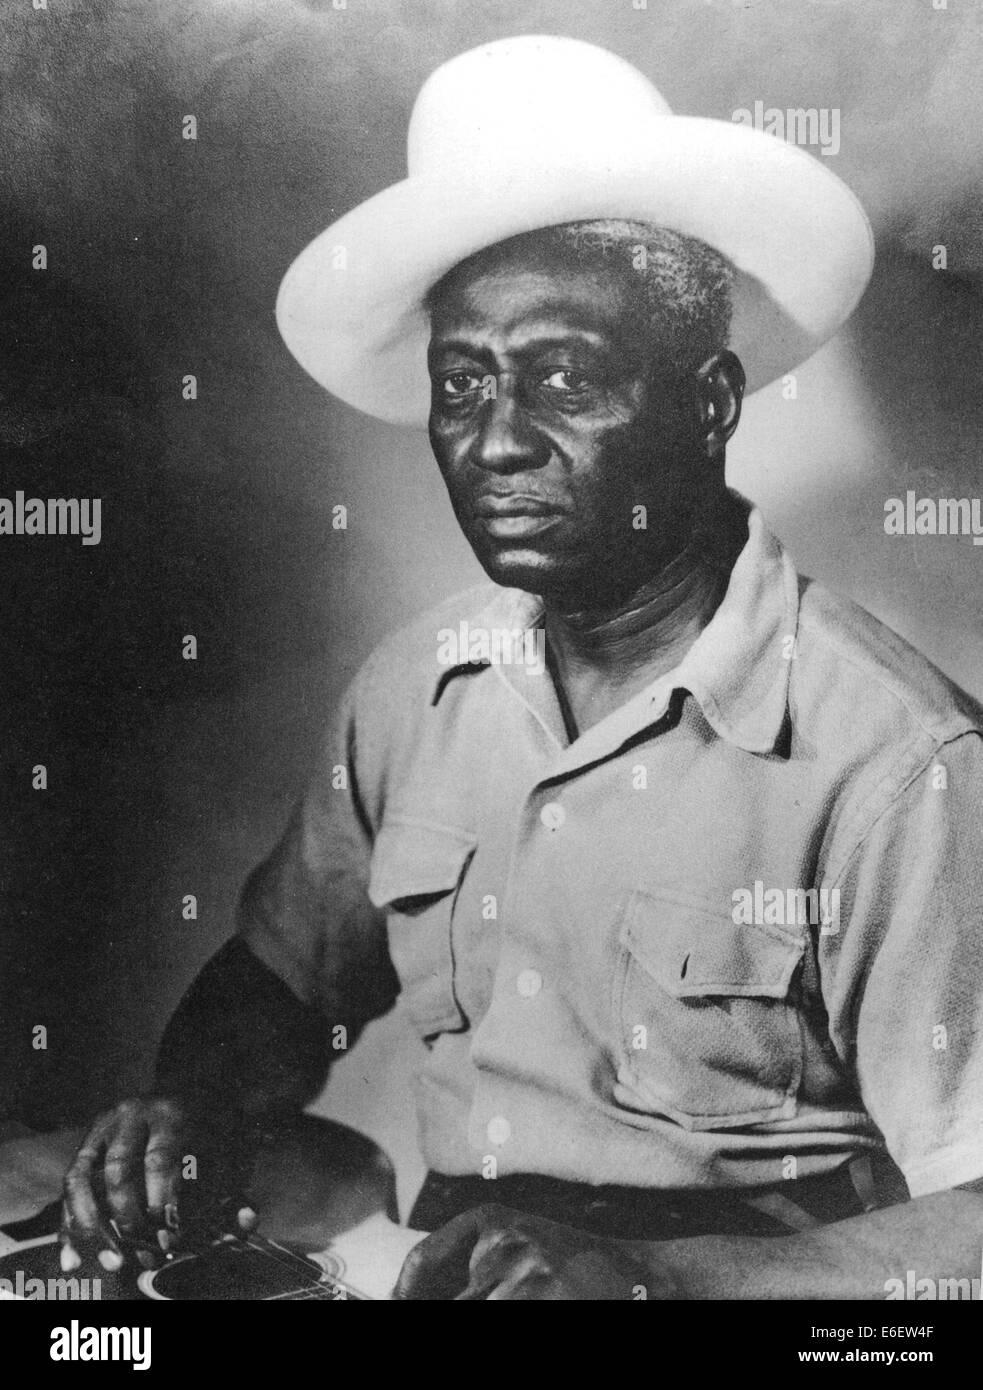 LEAD BELLY (1888-1949) musicien folk et blues US Photo Stock